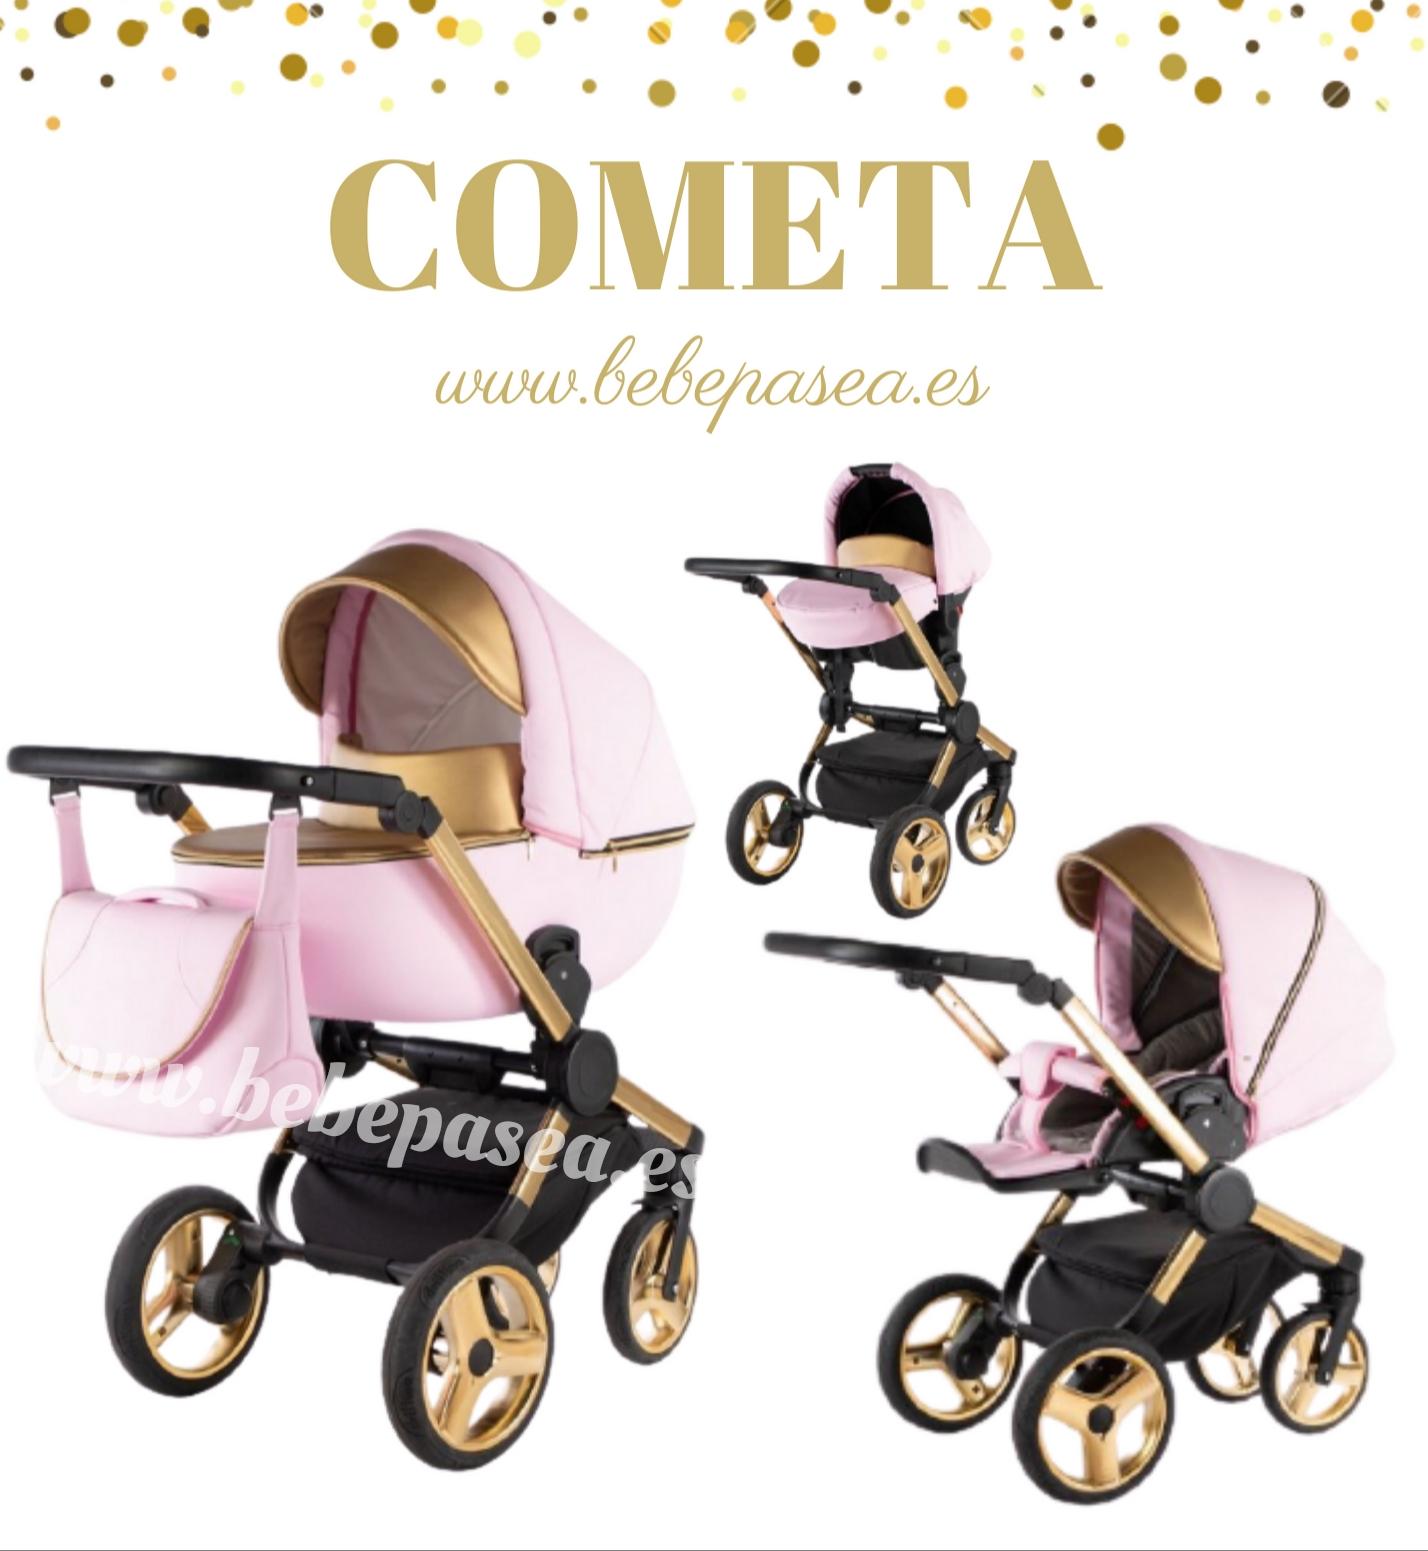 Carro bebé Cometa kajtex